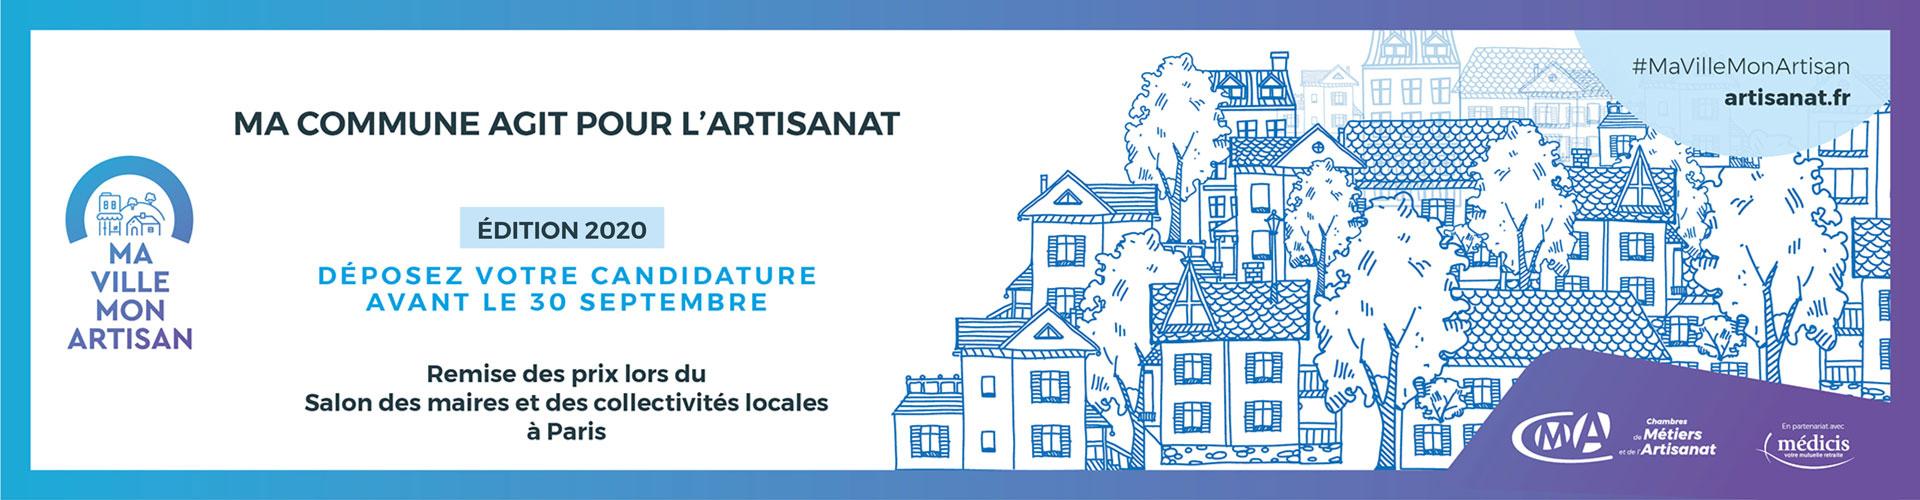 Chambre De Métiers Et De L'artisanat De L'ain | concernant Chambre Des Metiers Bobigny